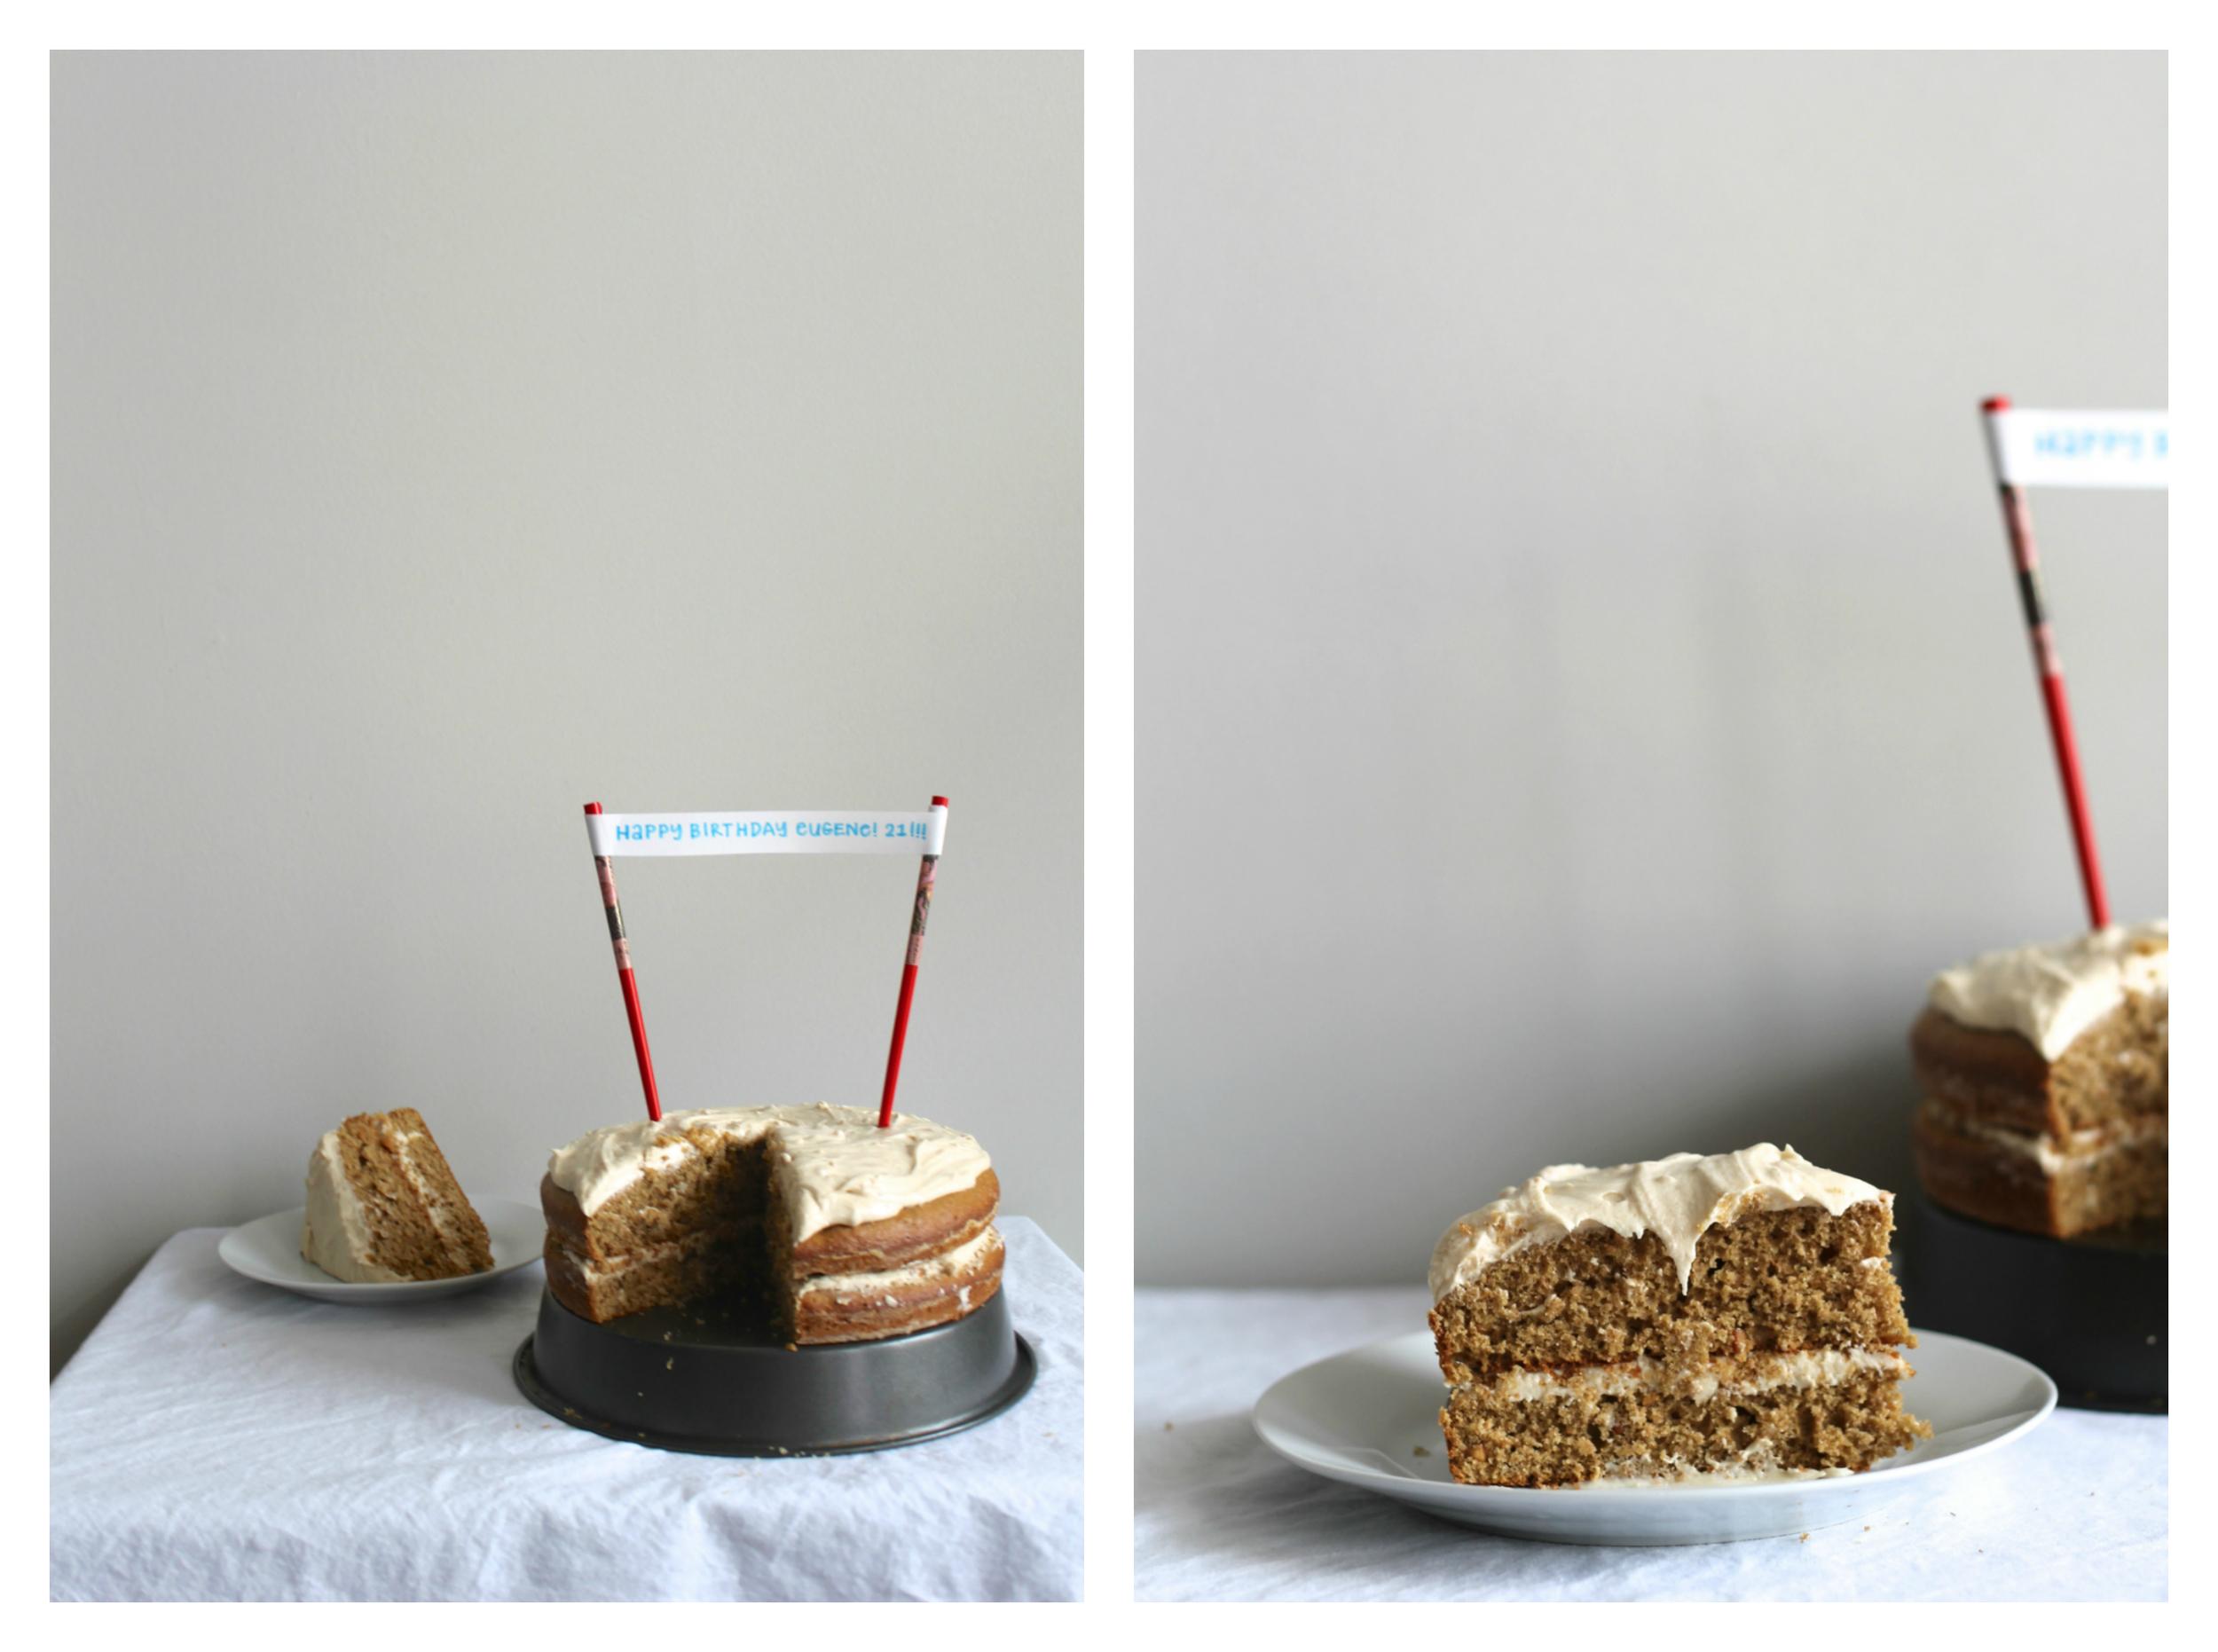 Peanut-butter-birthday-cake-15.jpg